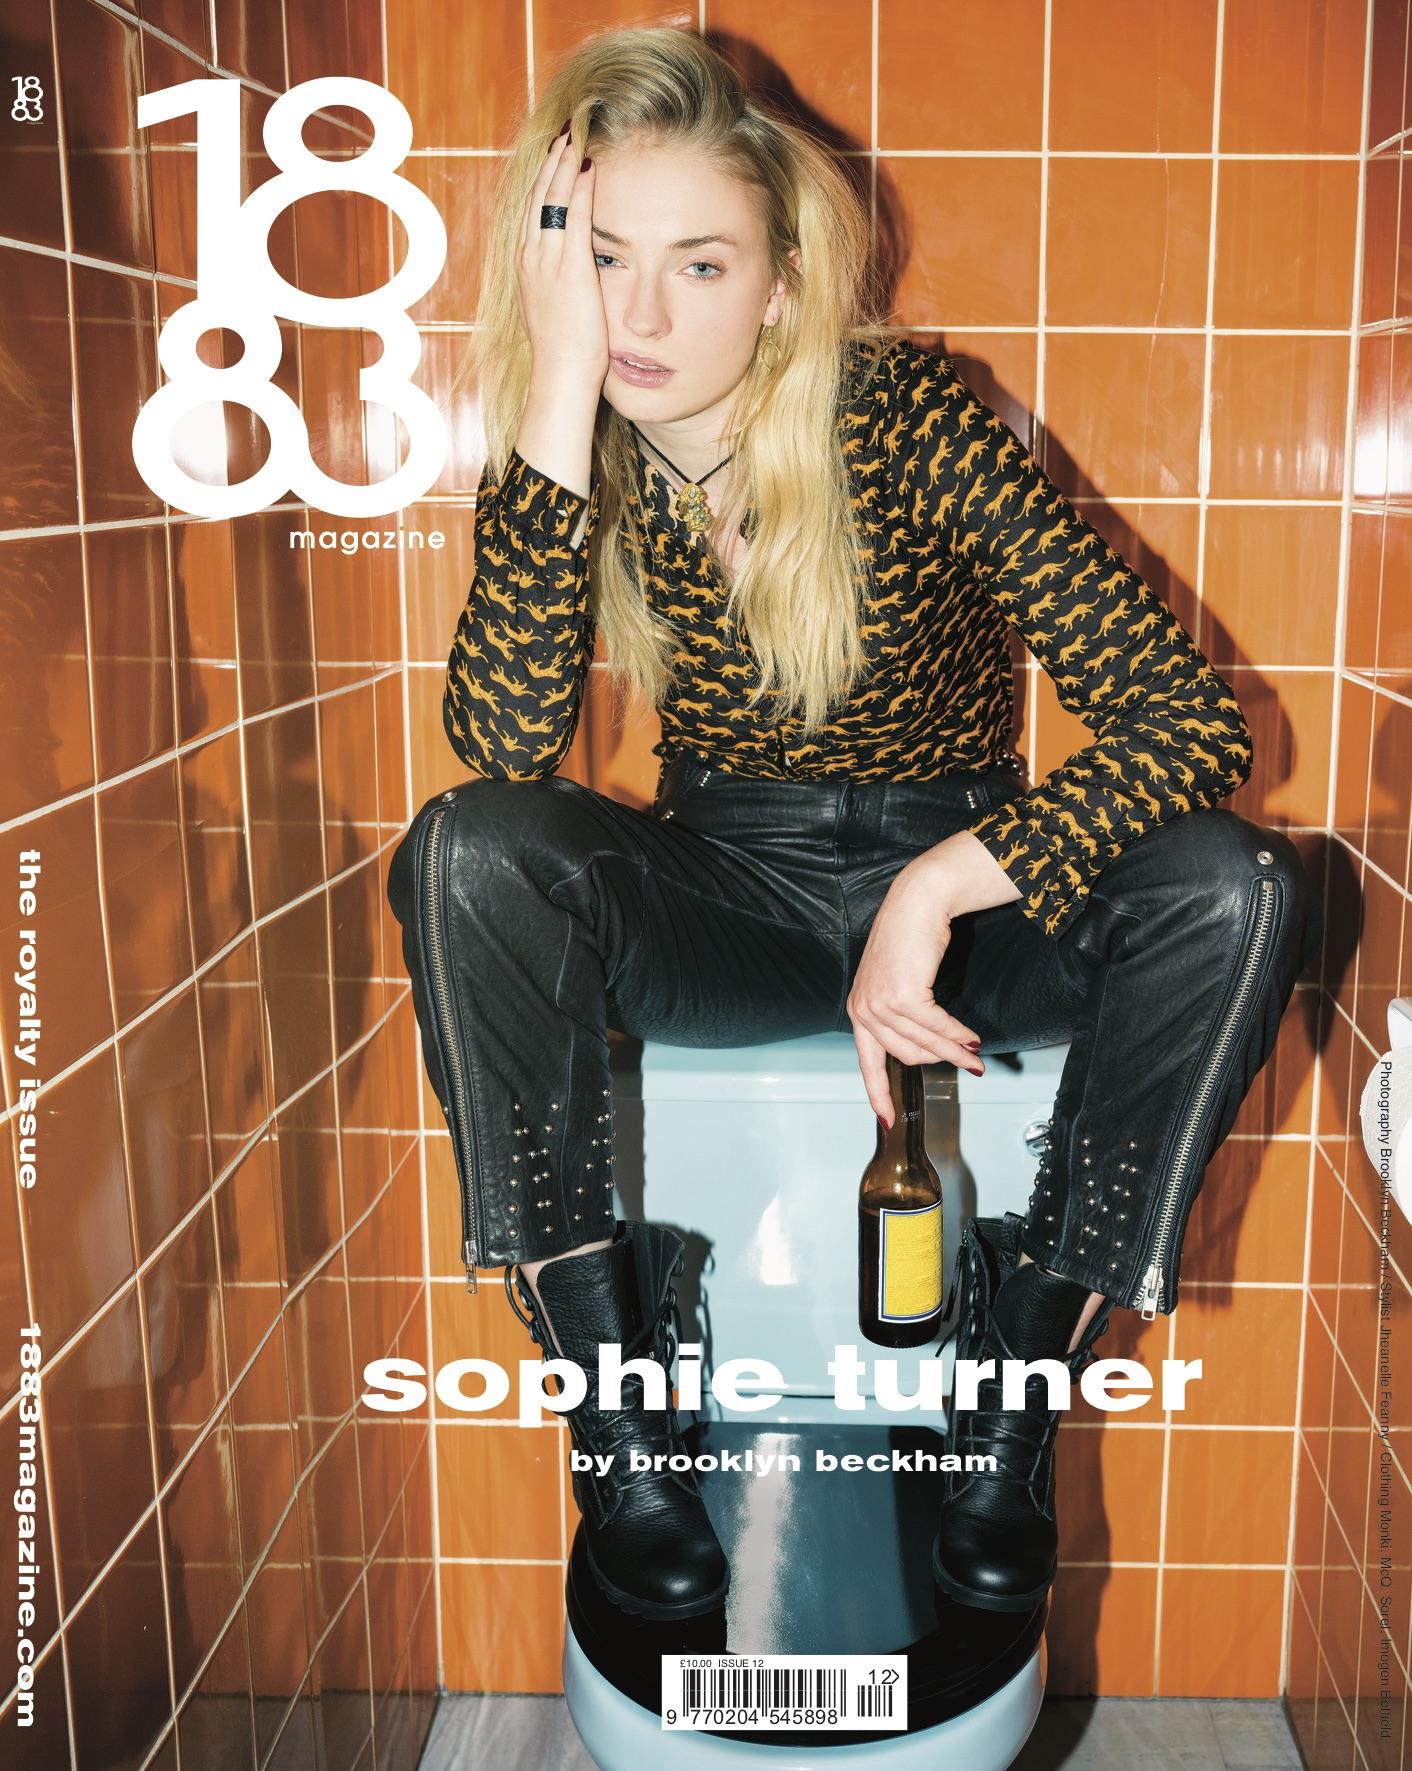 Sophie Turner - 1883 Magazine by Brooklyn Beckham (August 2018)